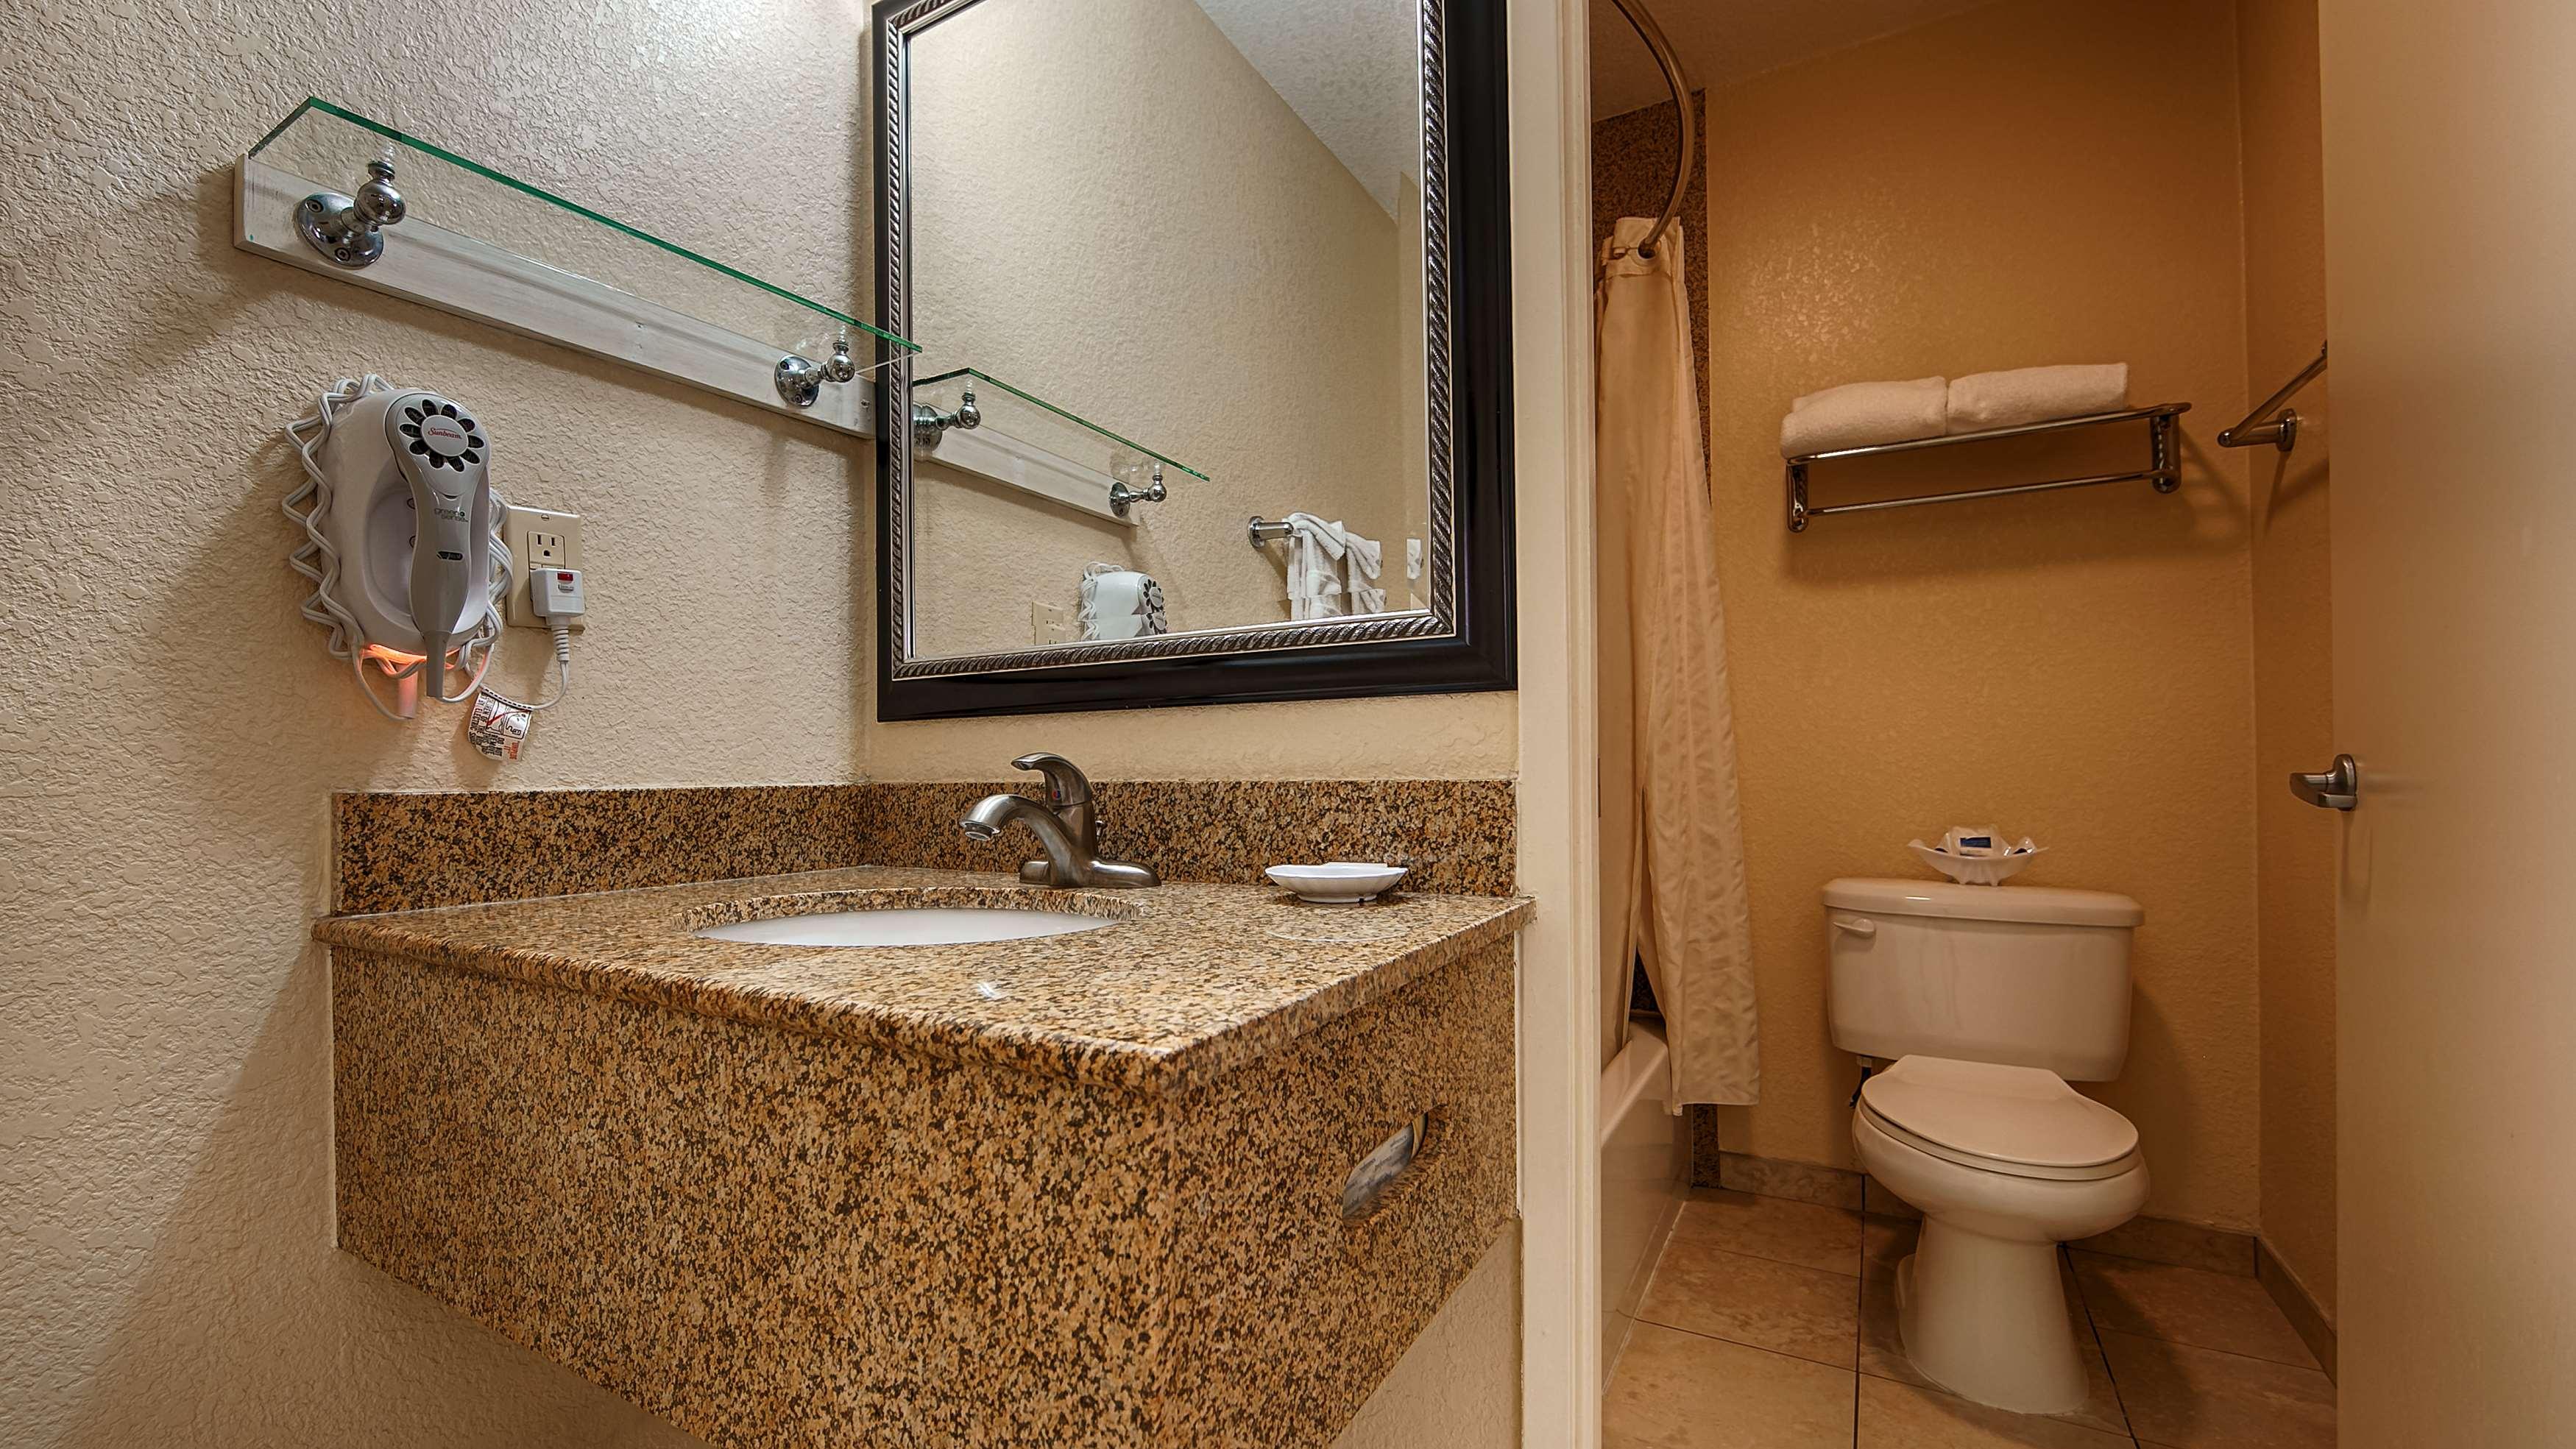 Best Western Poway/San Diego Hotel image 14